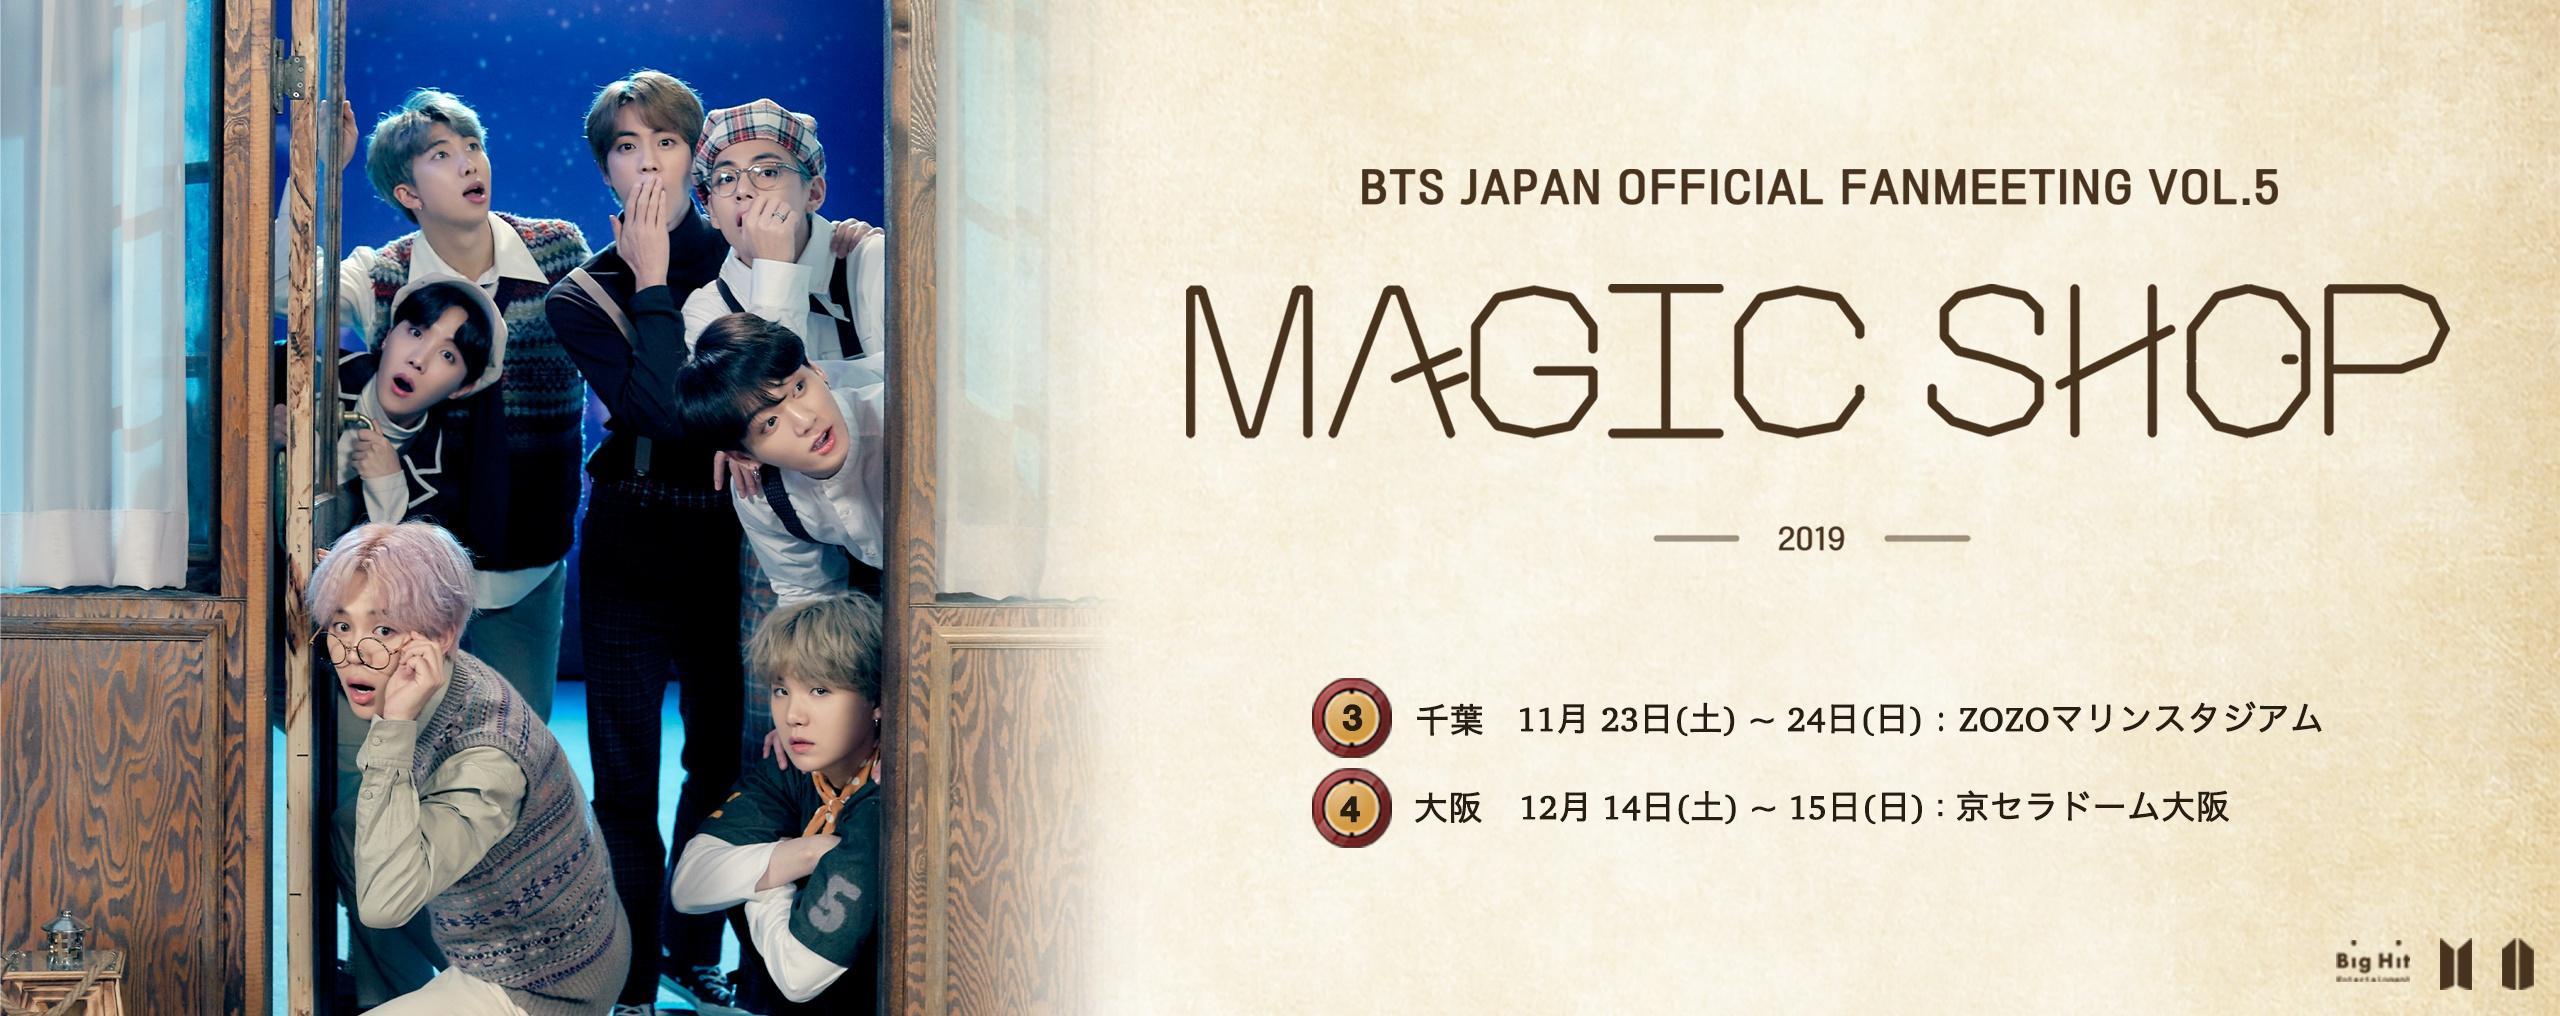 BTS JAPAN OFFICIAL FANMEETING VOL.5 [ MAGIC SHOP ] 開催決定!